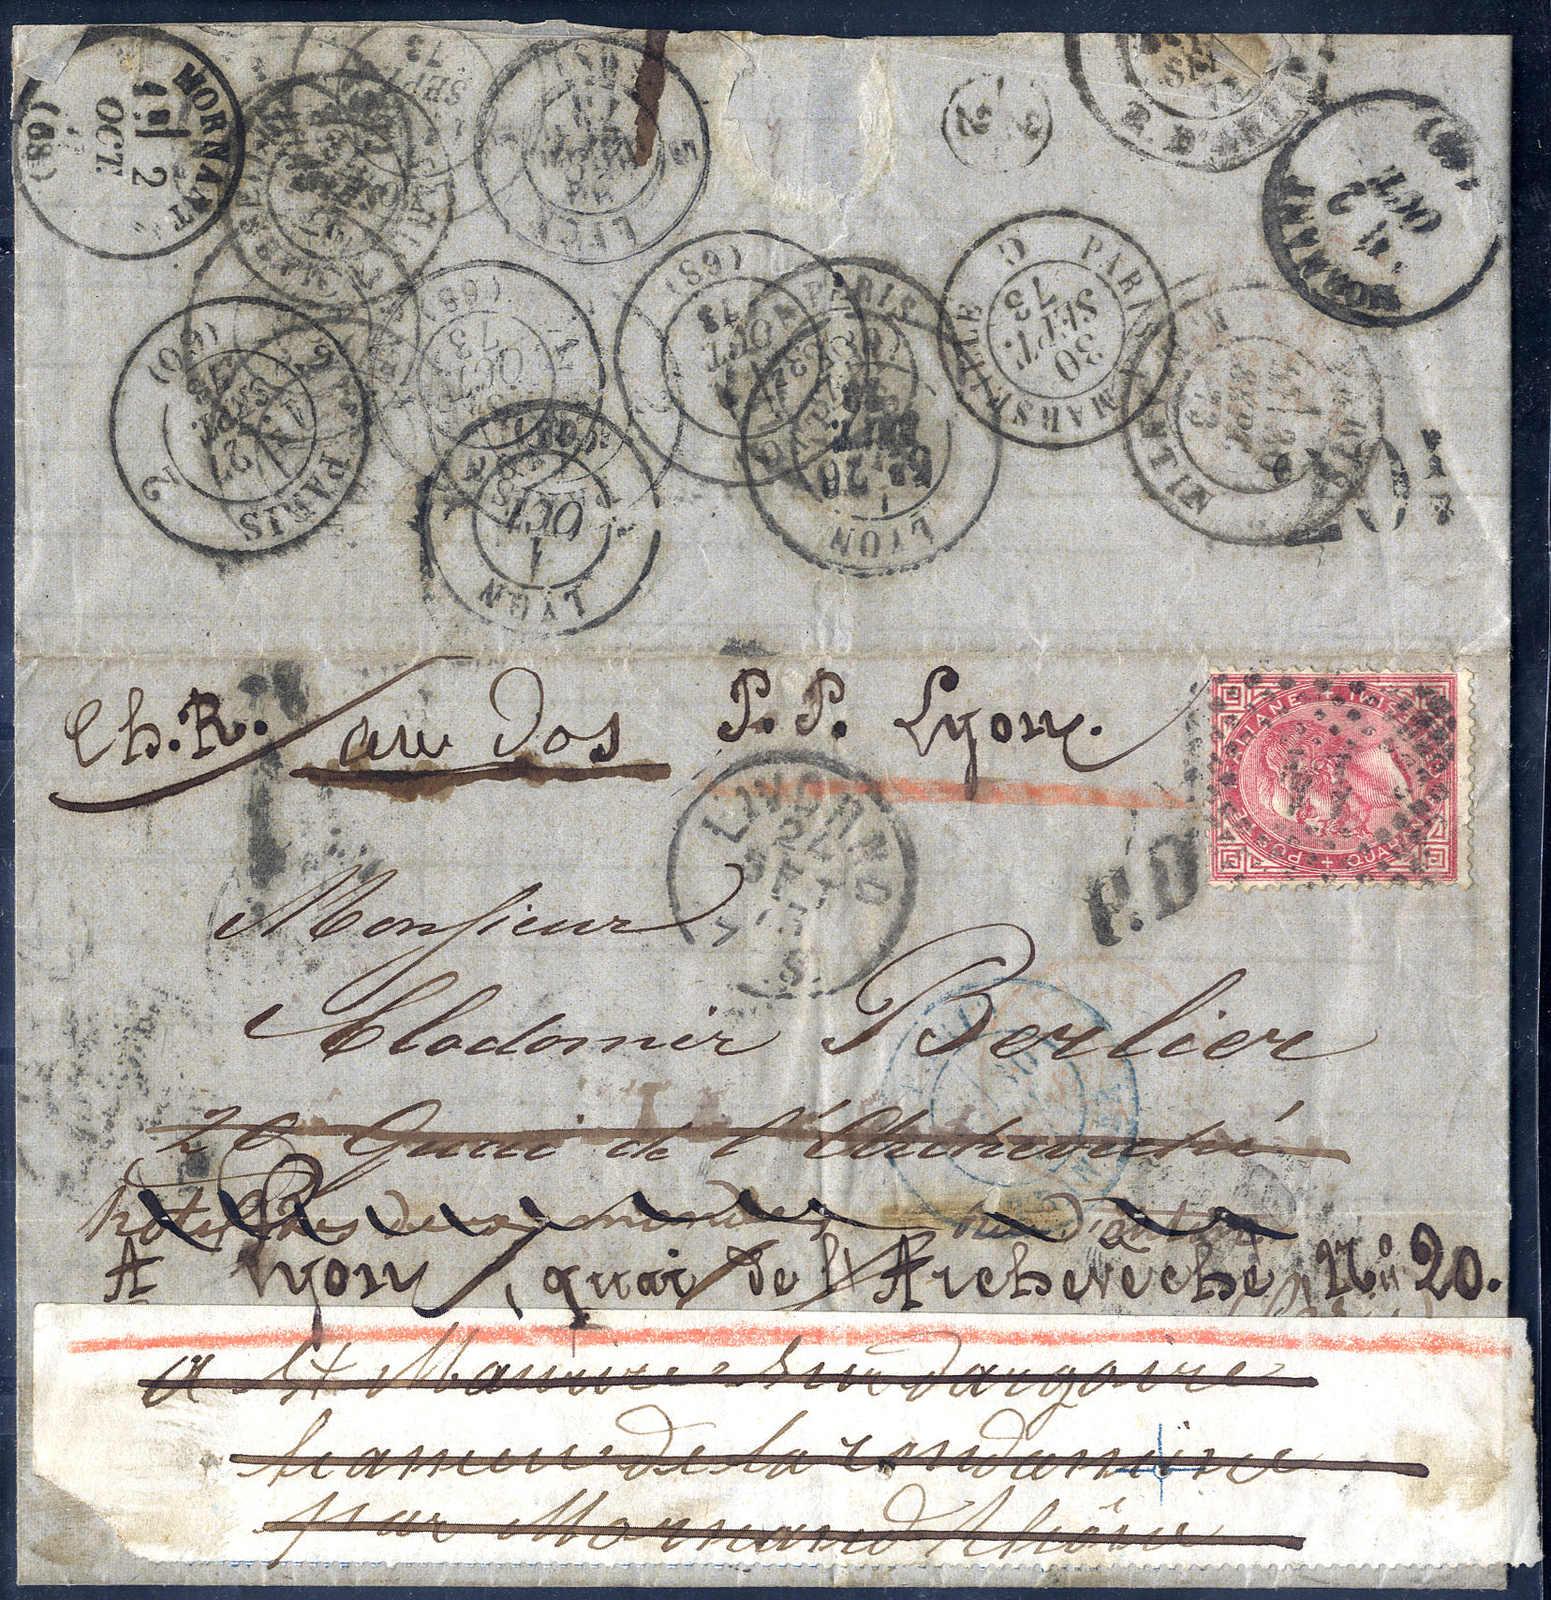 Lot 552 - europe Italian Kingdom -  Viennafil Auktionen 63rd LIVE AUCTION